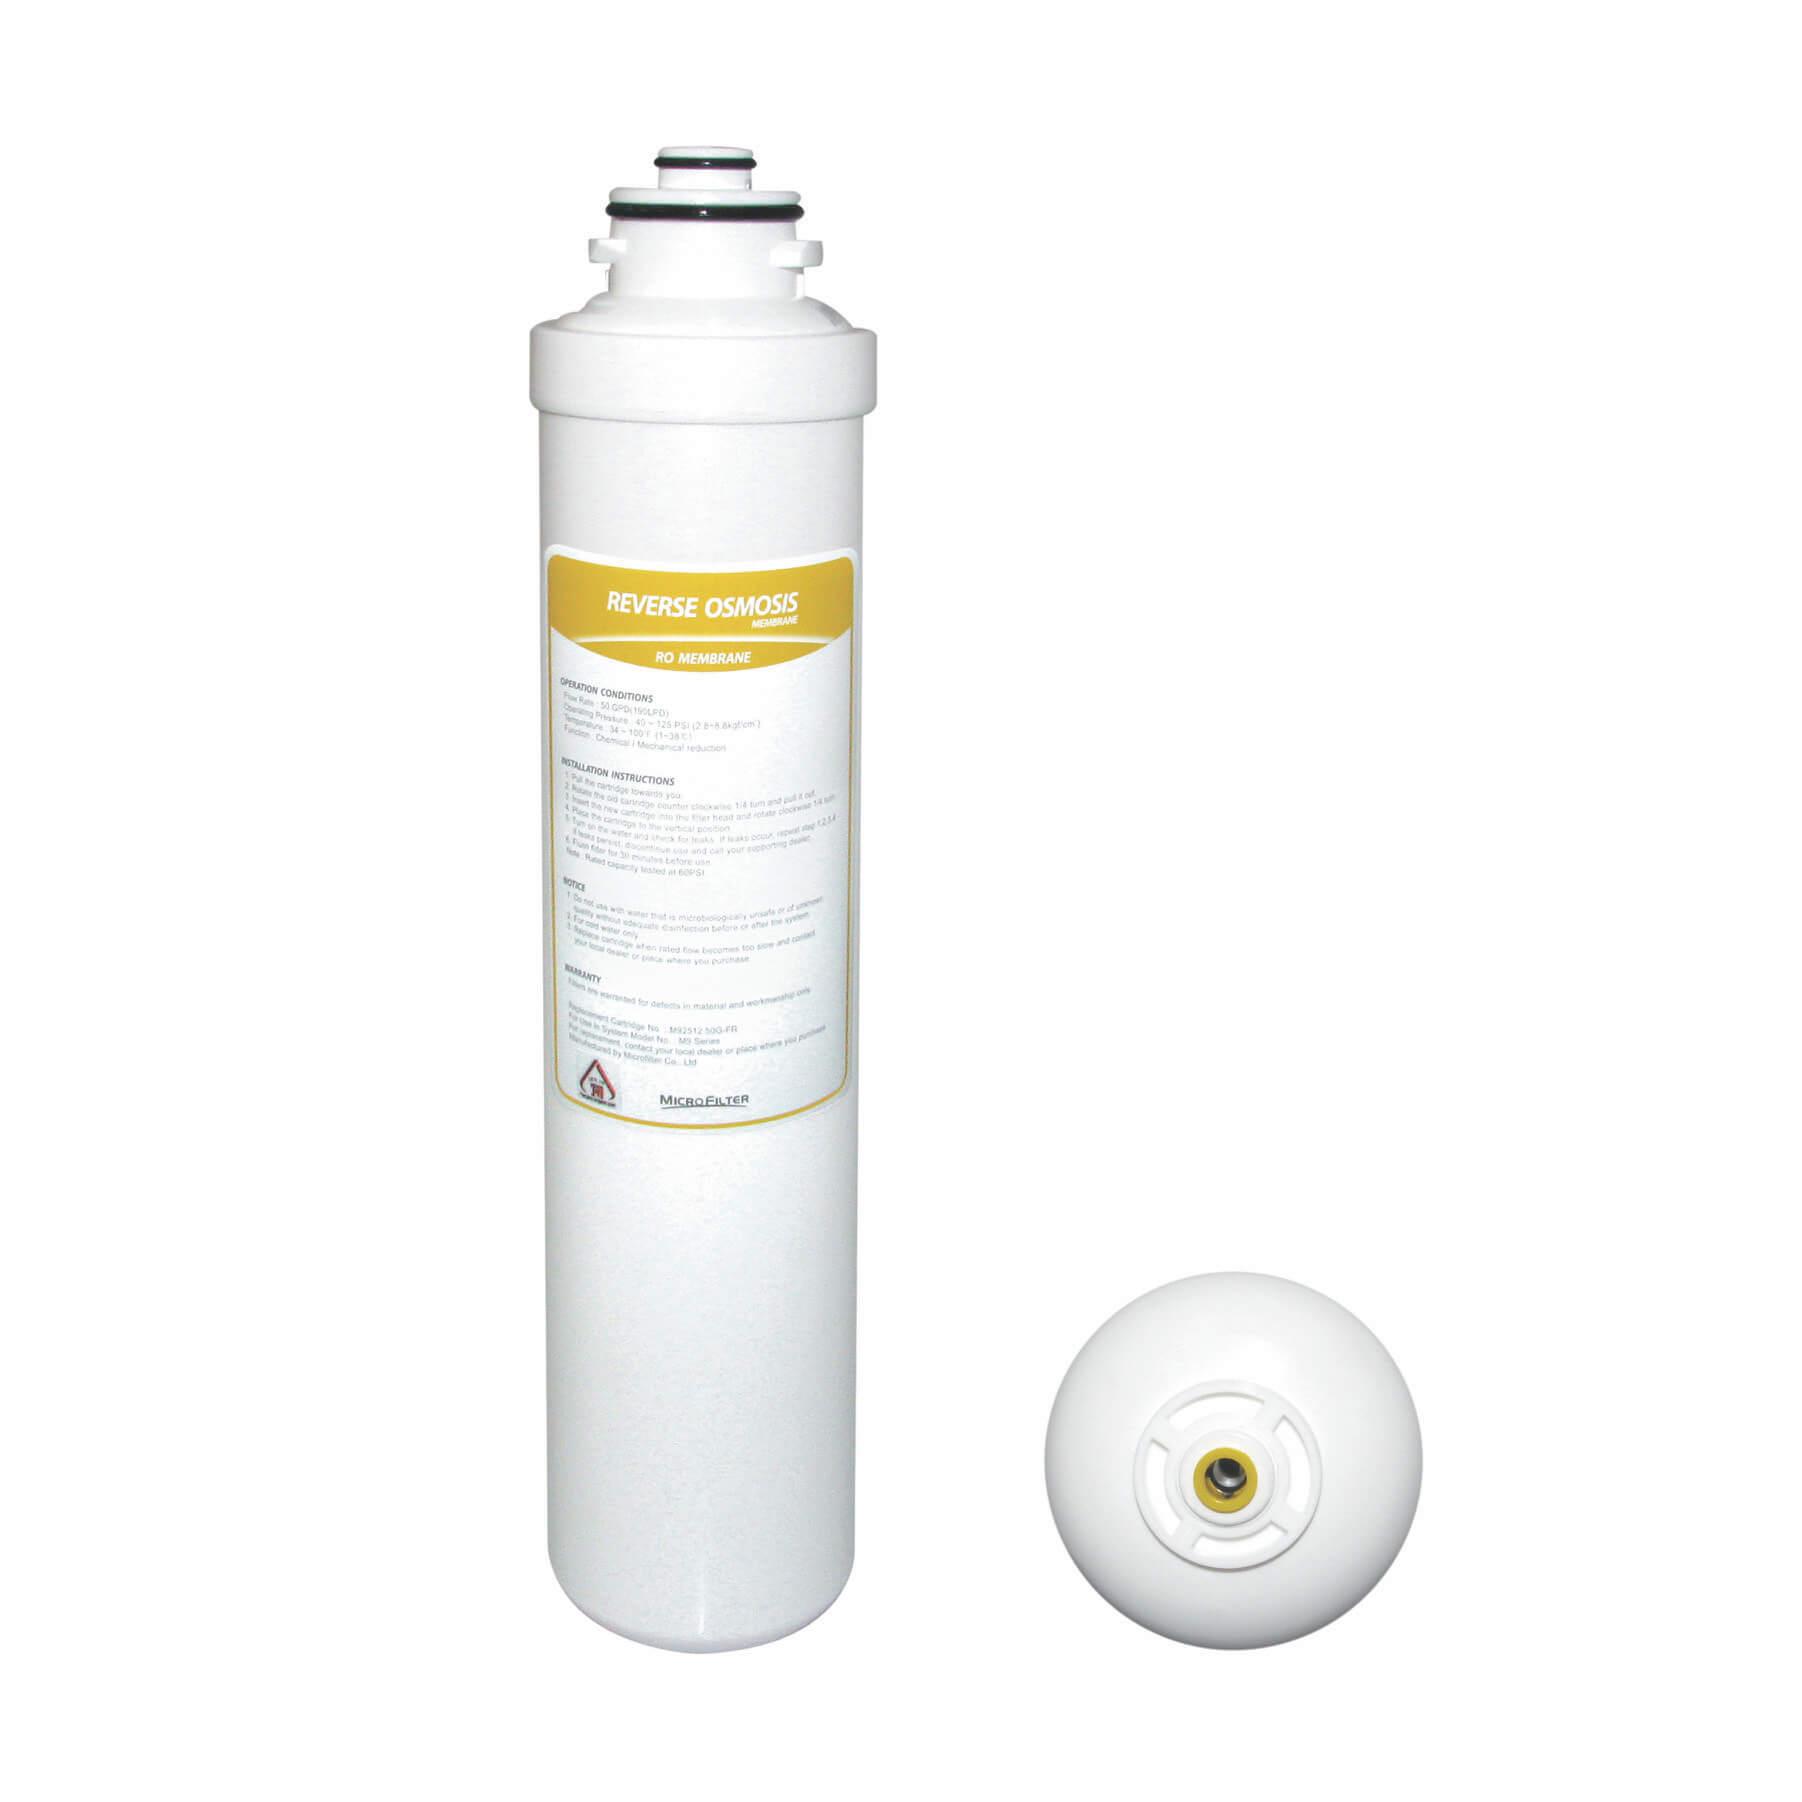 M9 - סנן צהוב ממברנה - Microfilter